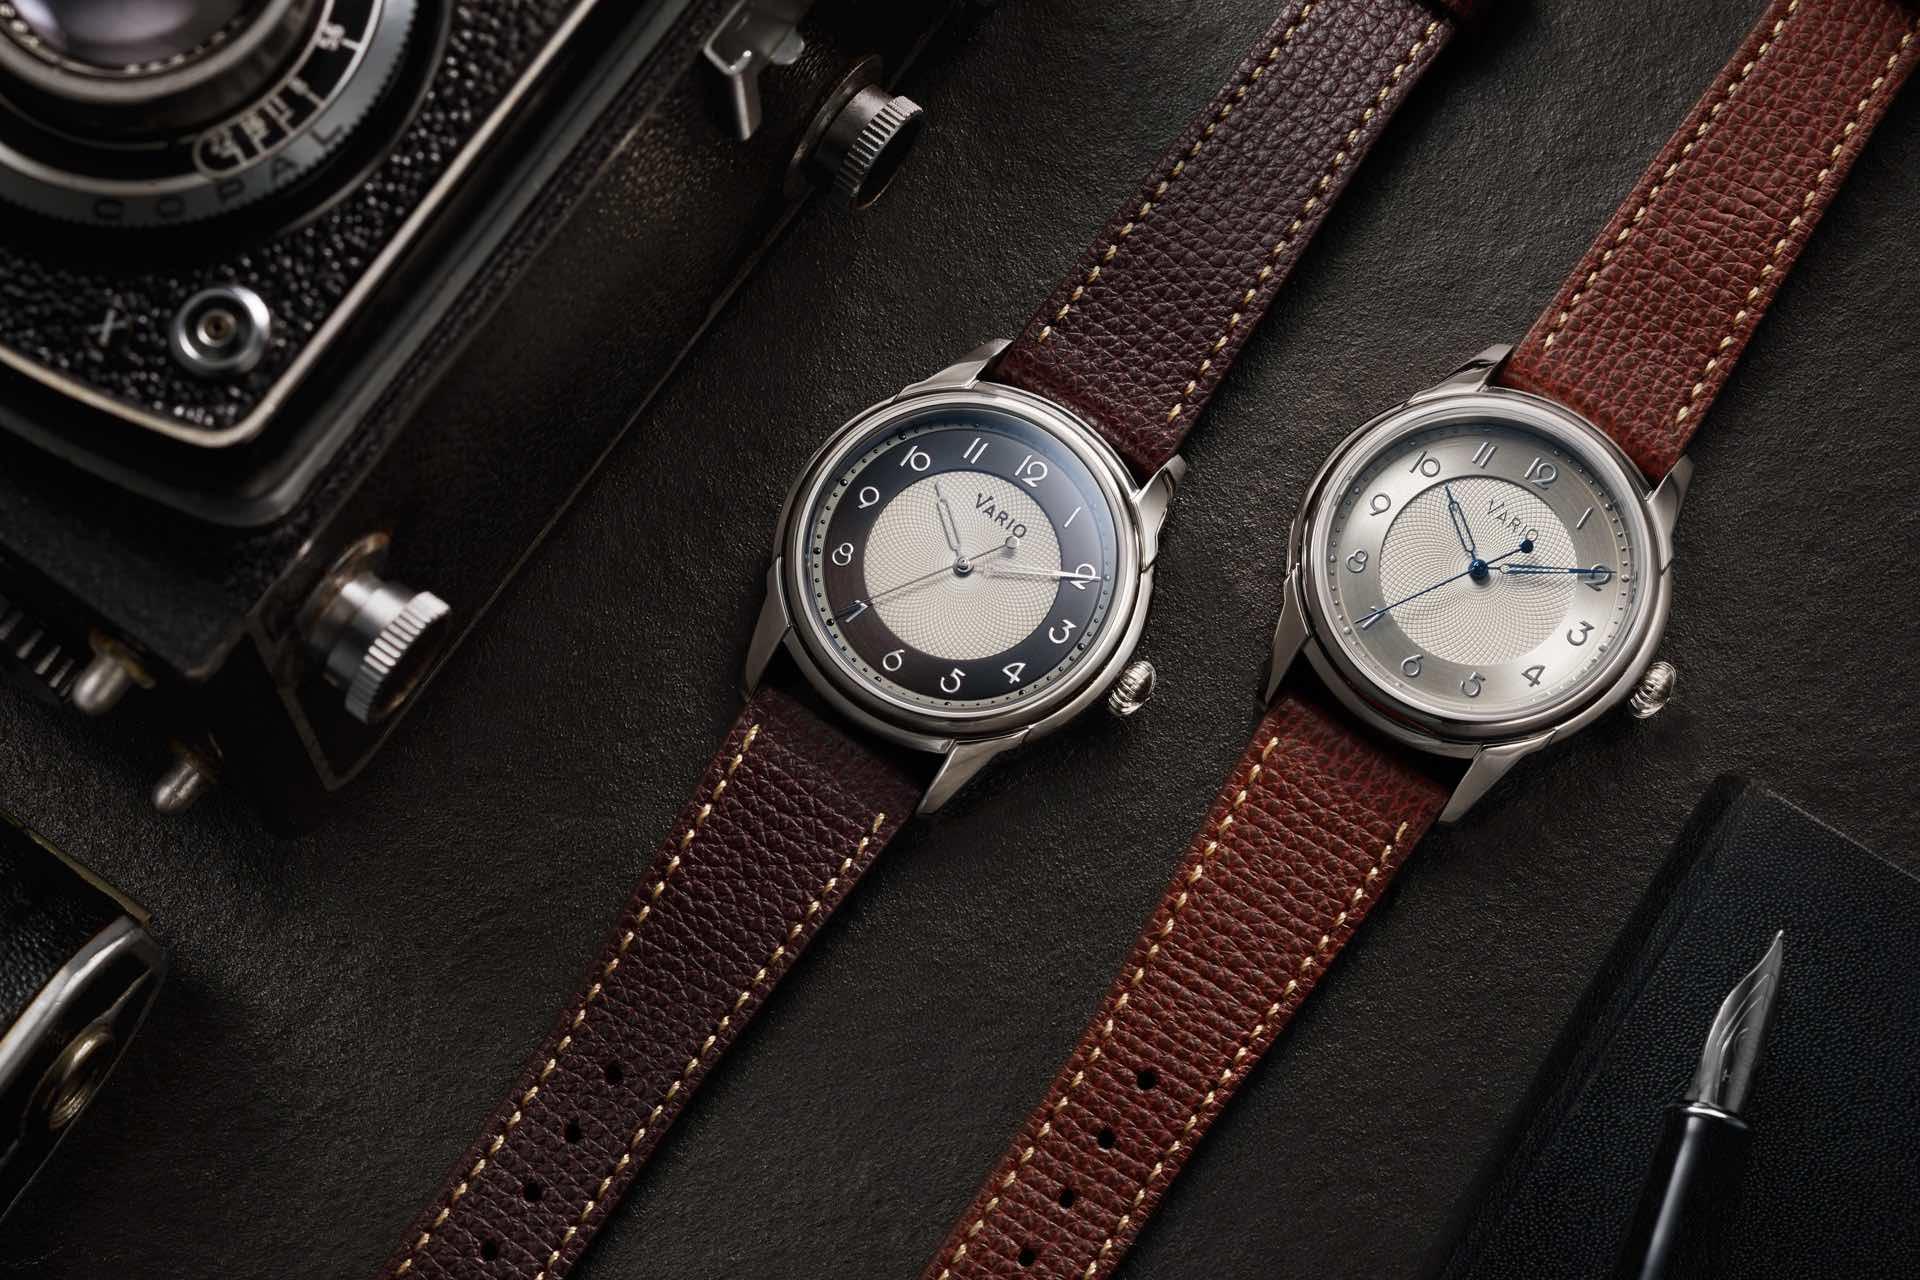 Value Proposition - Vario Empire Automatic Art-Deco Watch